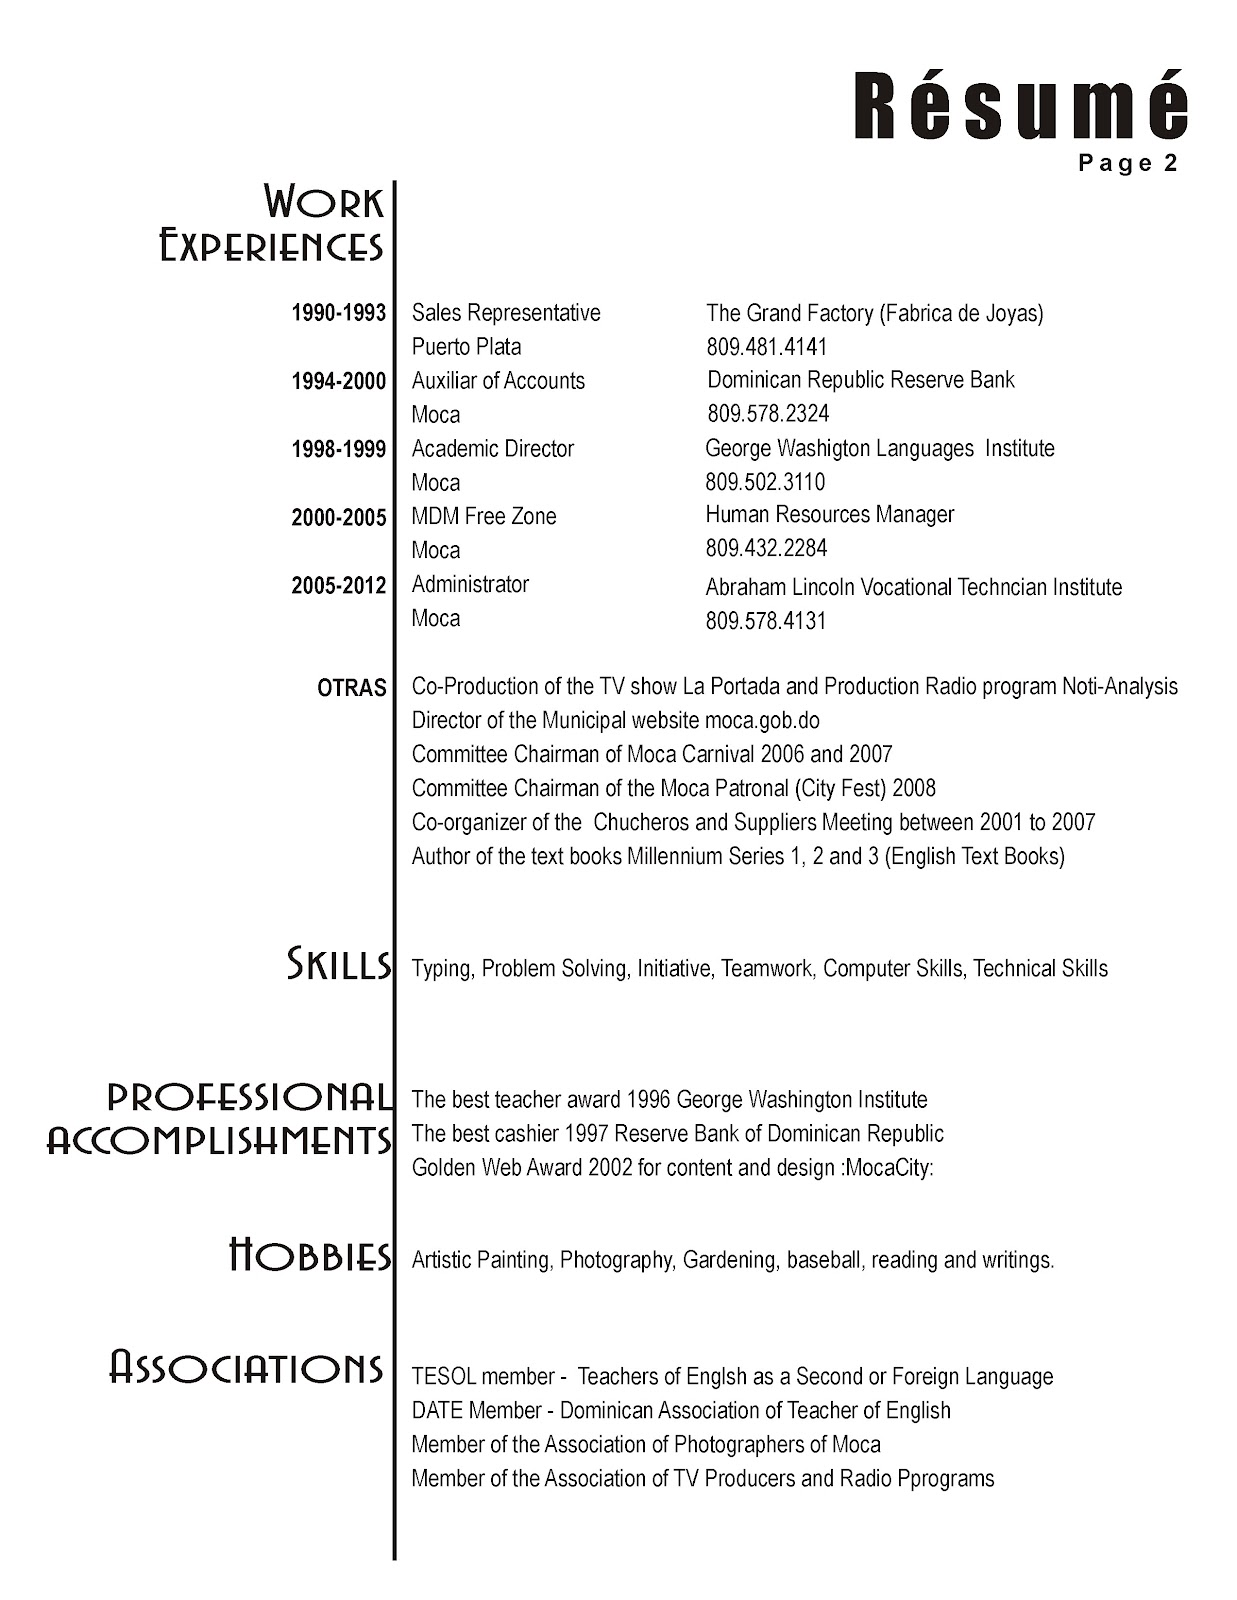 MOCACITY::: FRANKLIN DE JS. TORRES: Résumé or Curriculum Vitae (CV)